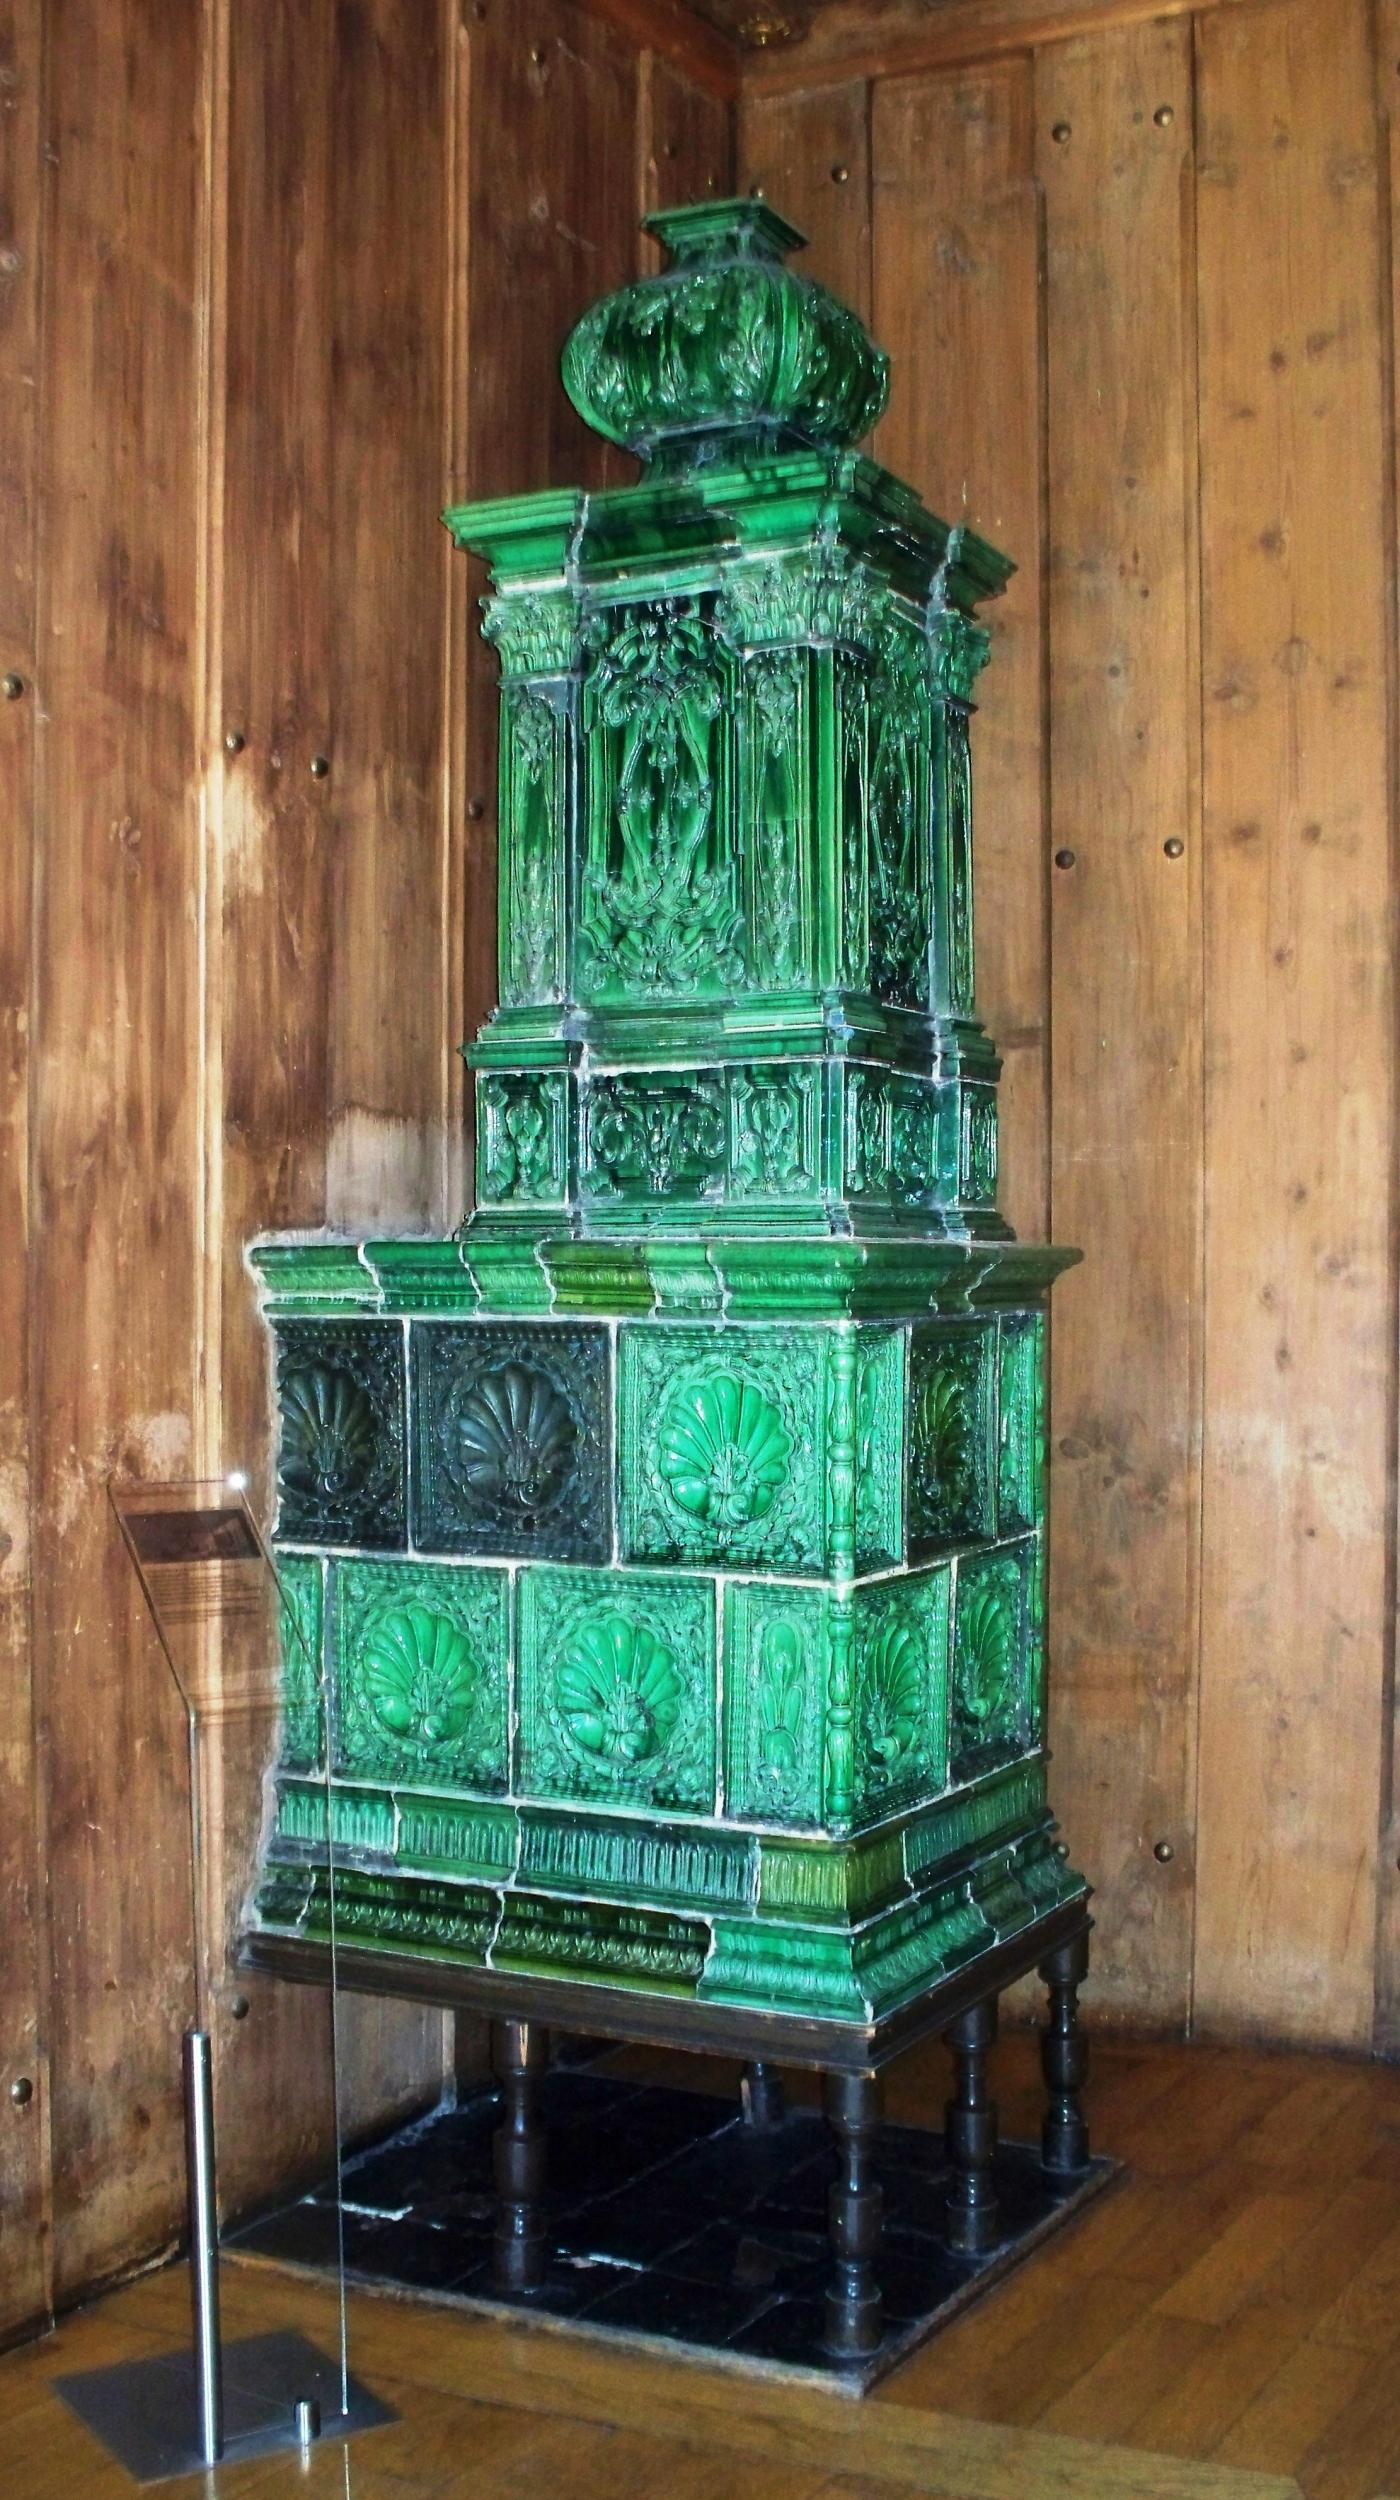 Alter Kachelofen file kachelofen im alten rathaus jpg wikimedia commons